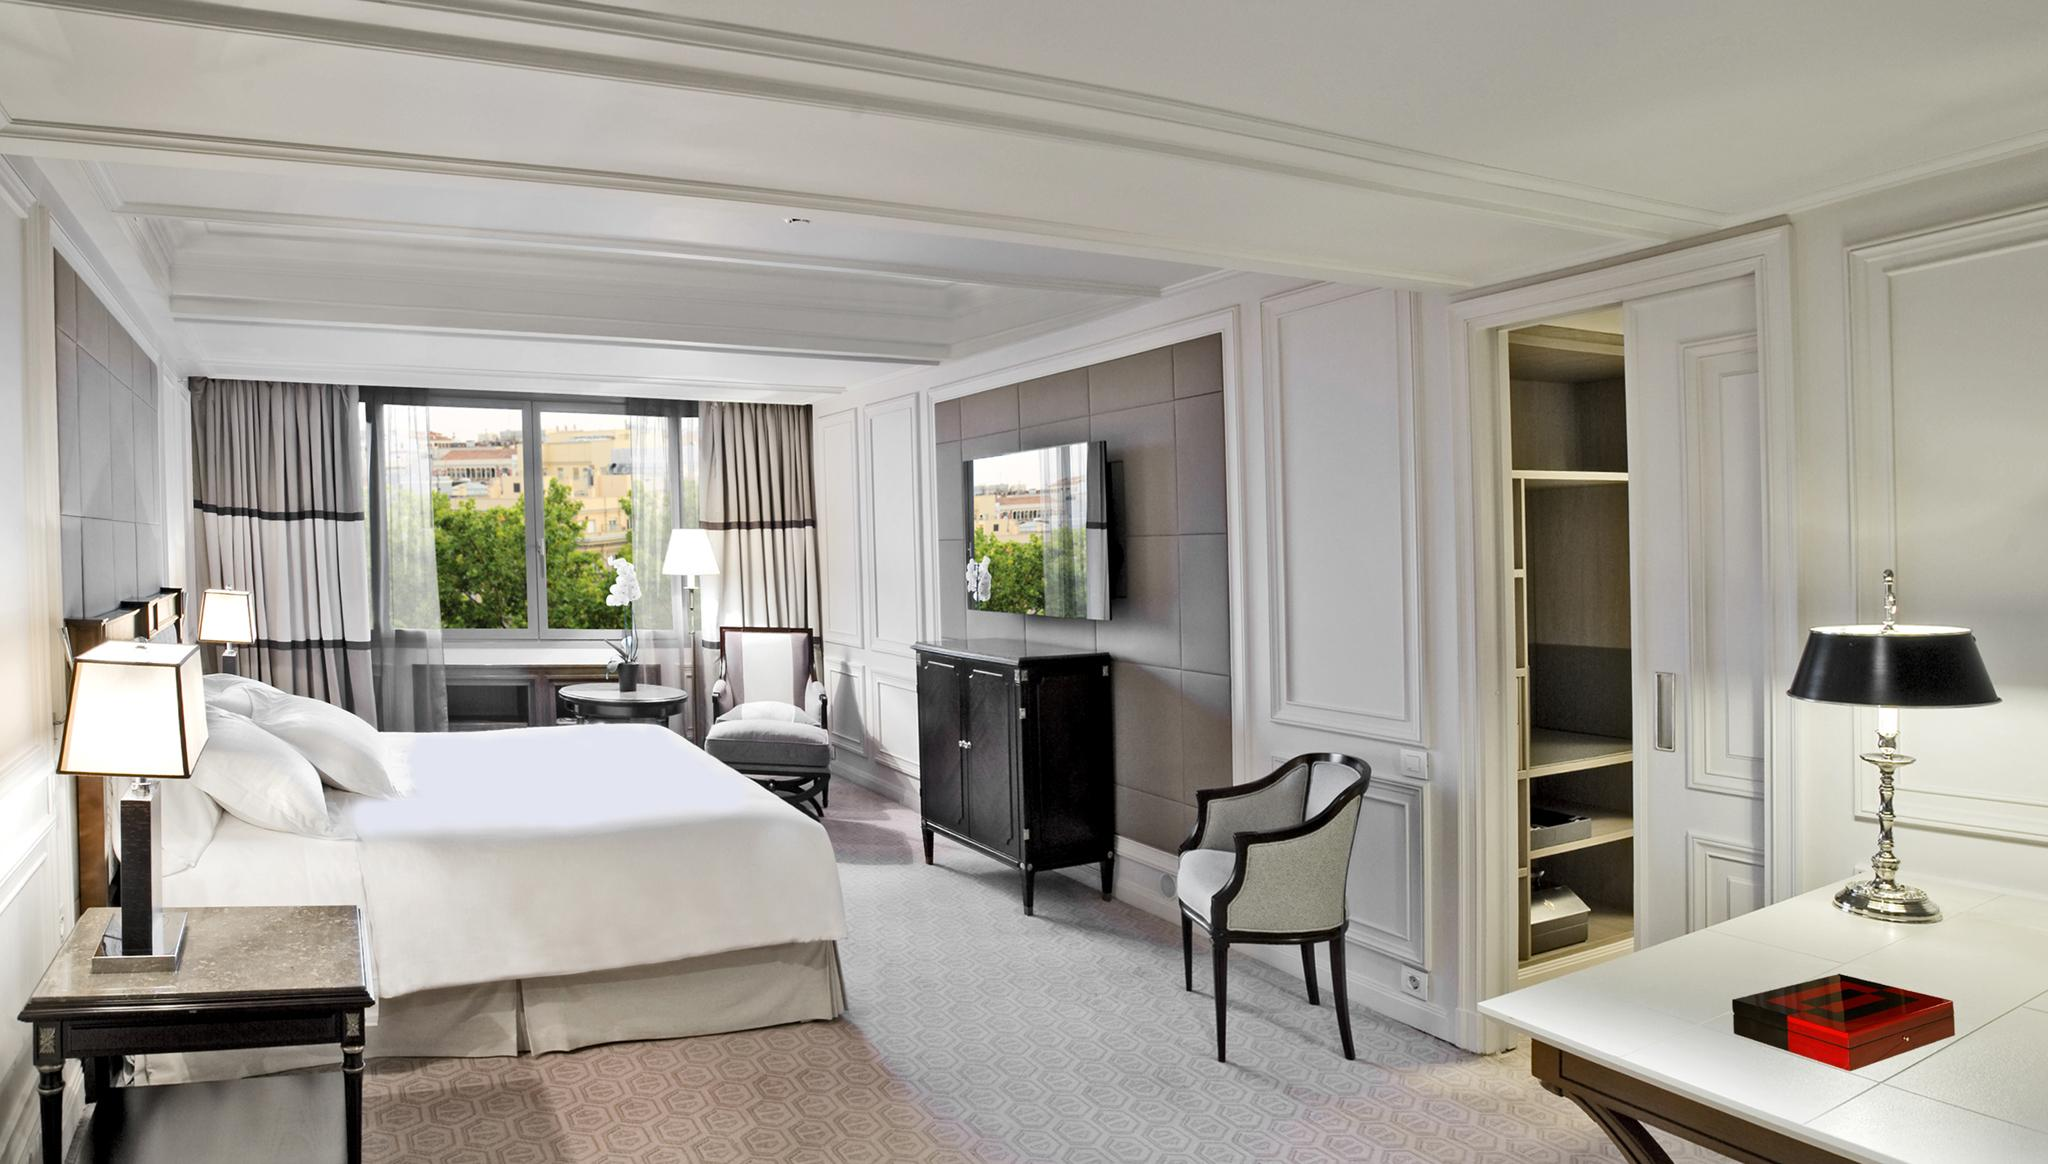 Grand Prestige Hotel Villa Magna, Madrid